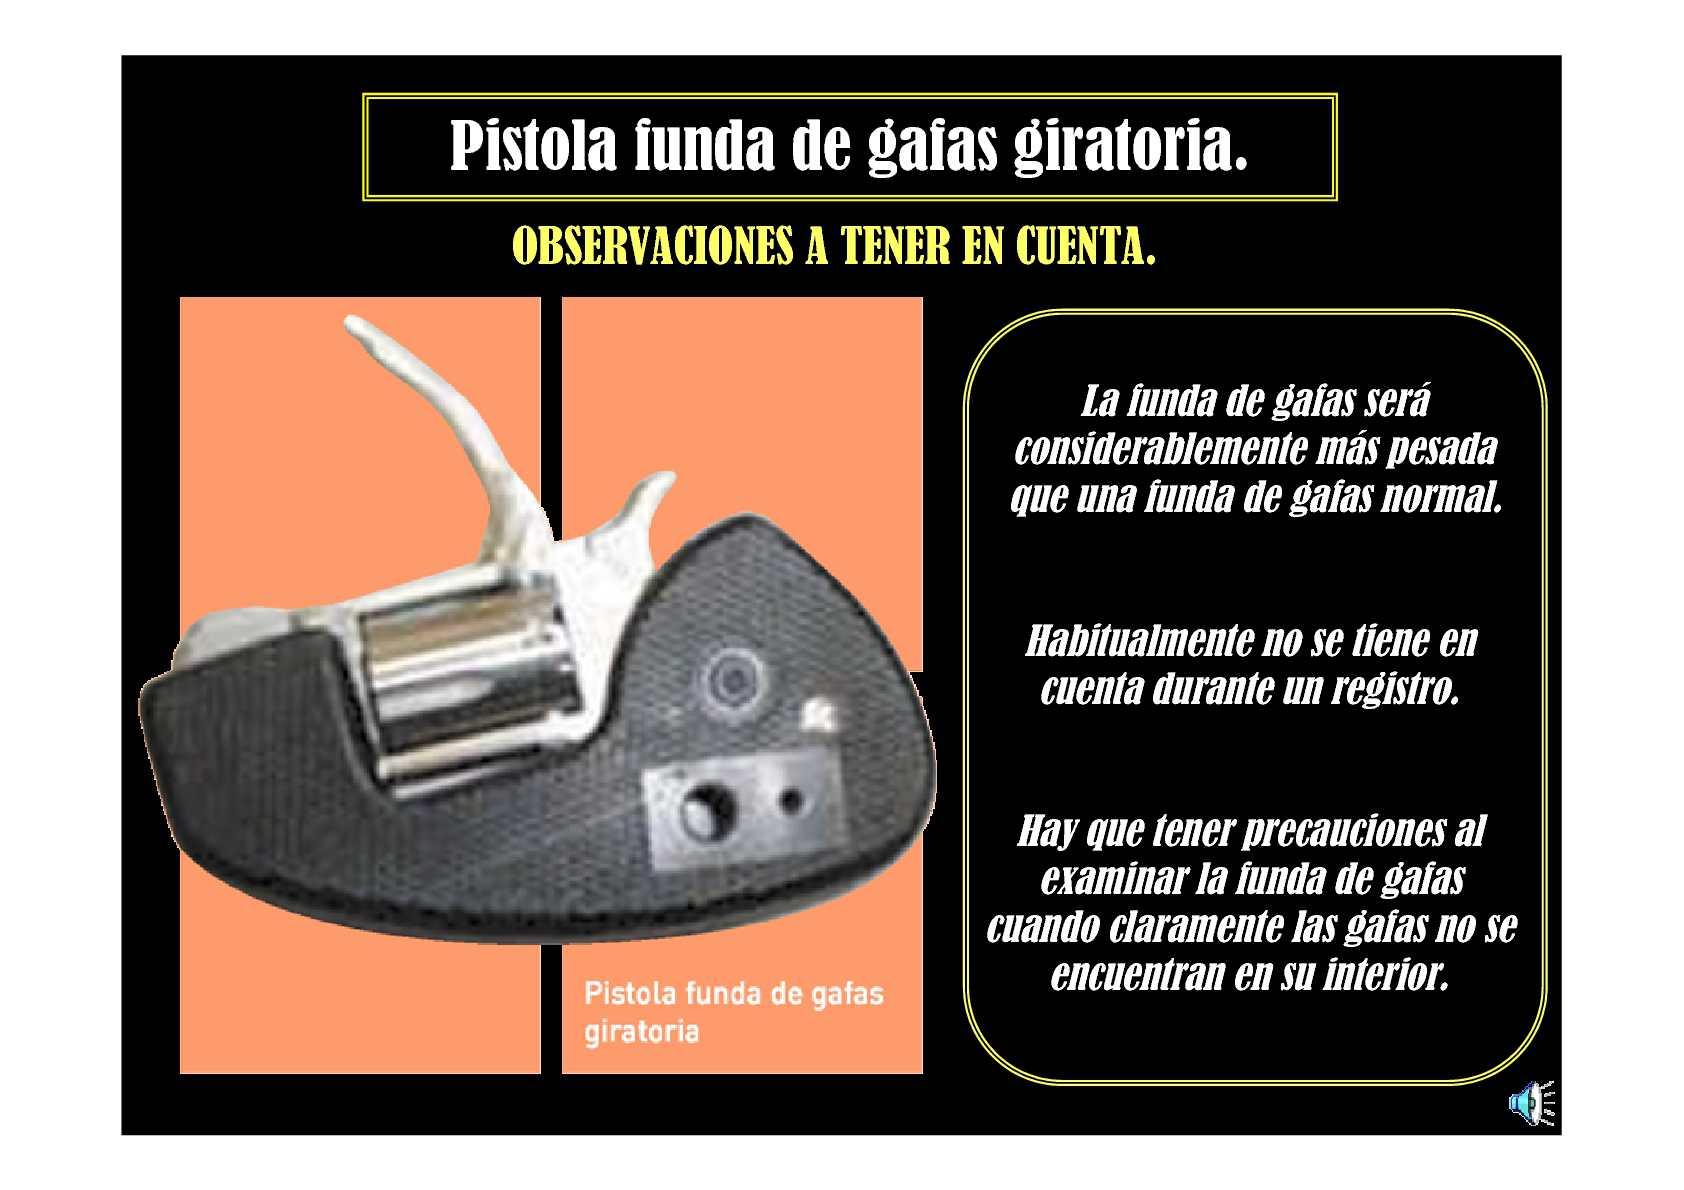 Seguridad Privada. Armas disimuladas. - CALAMEO Downloader